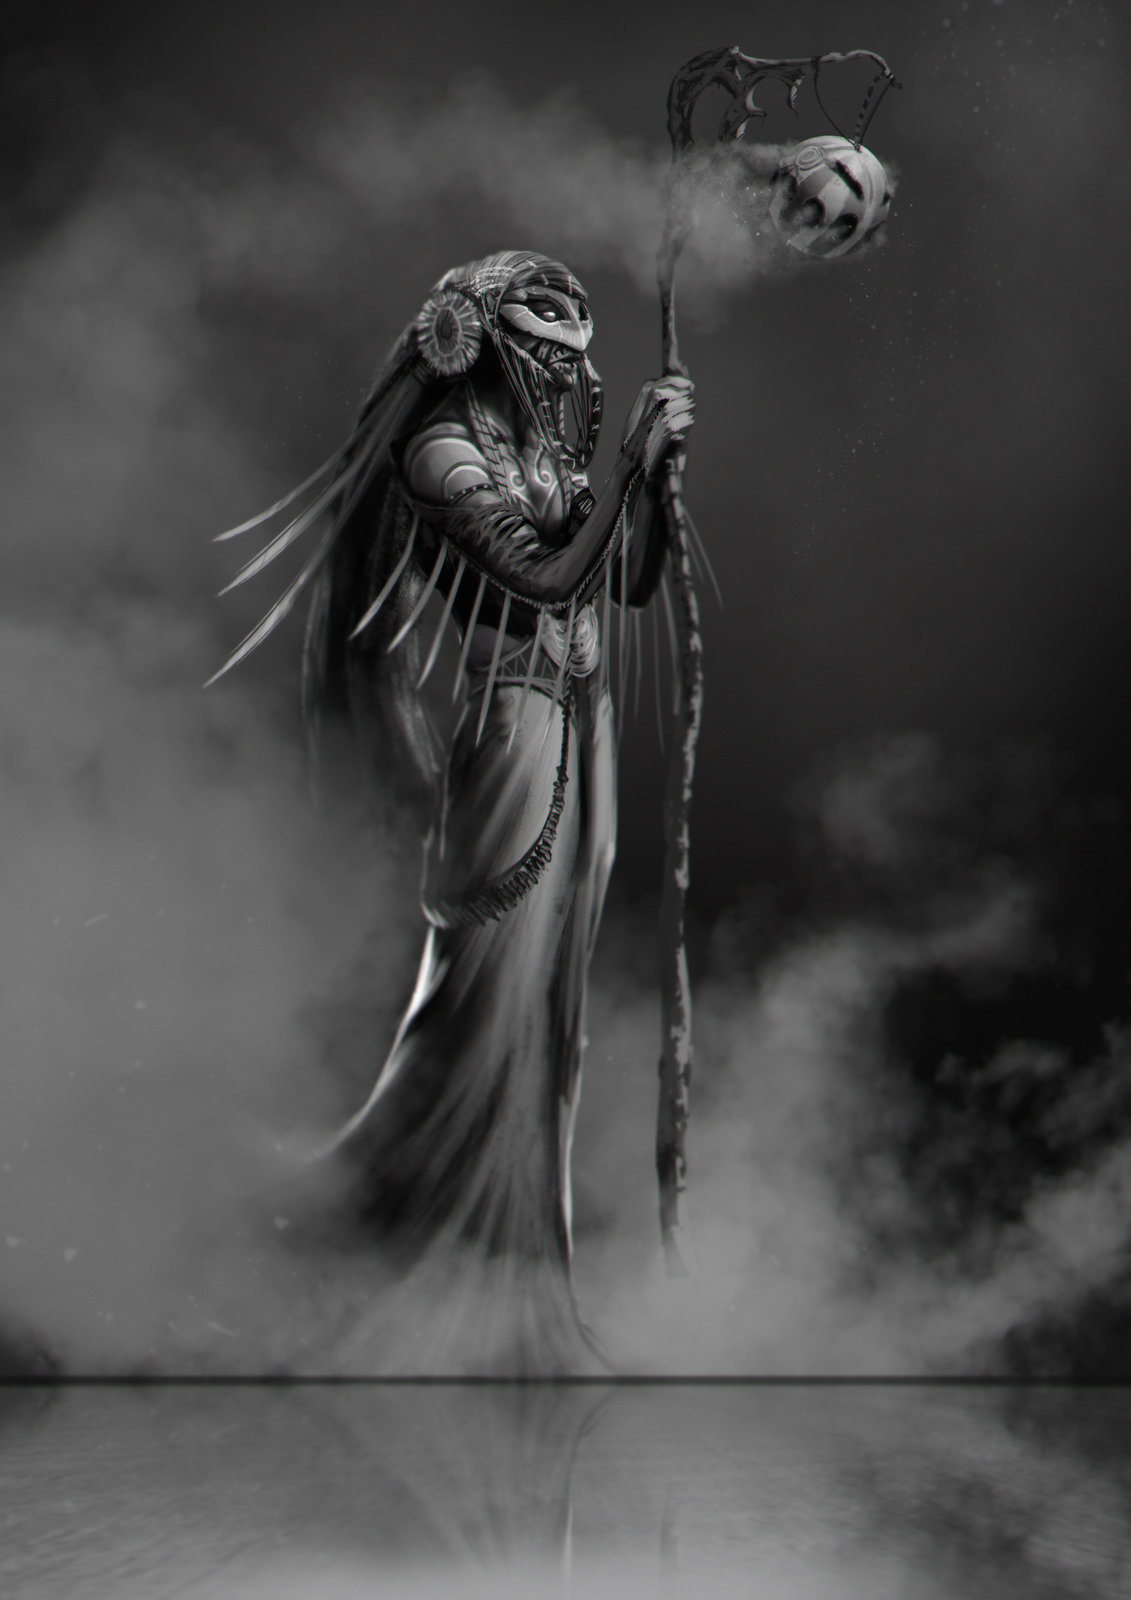 Shaman of Mist